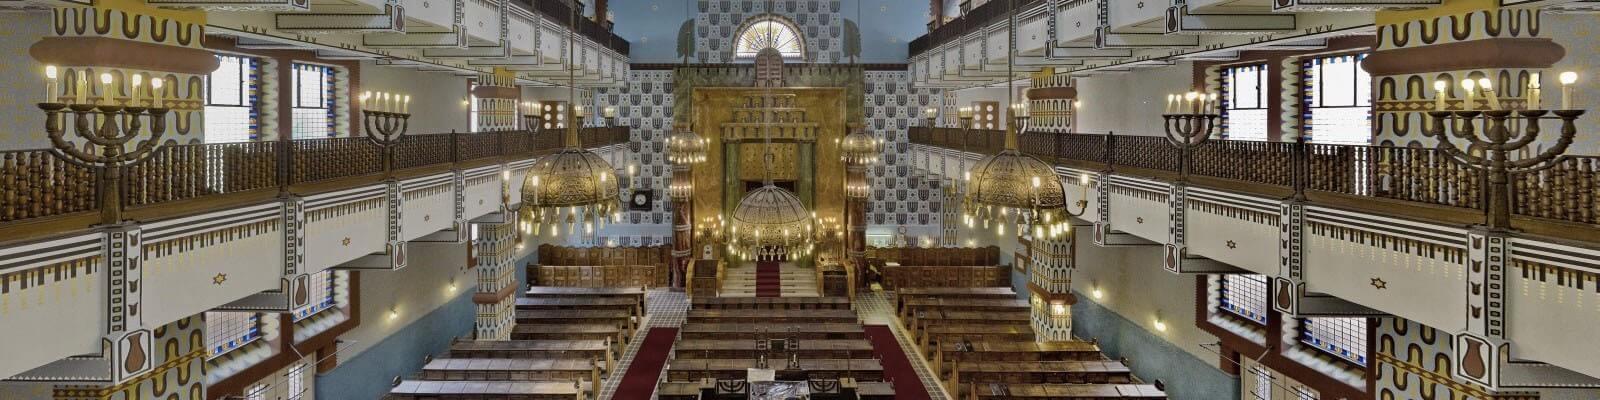 Budapest synagogue orthodoxe